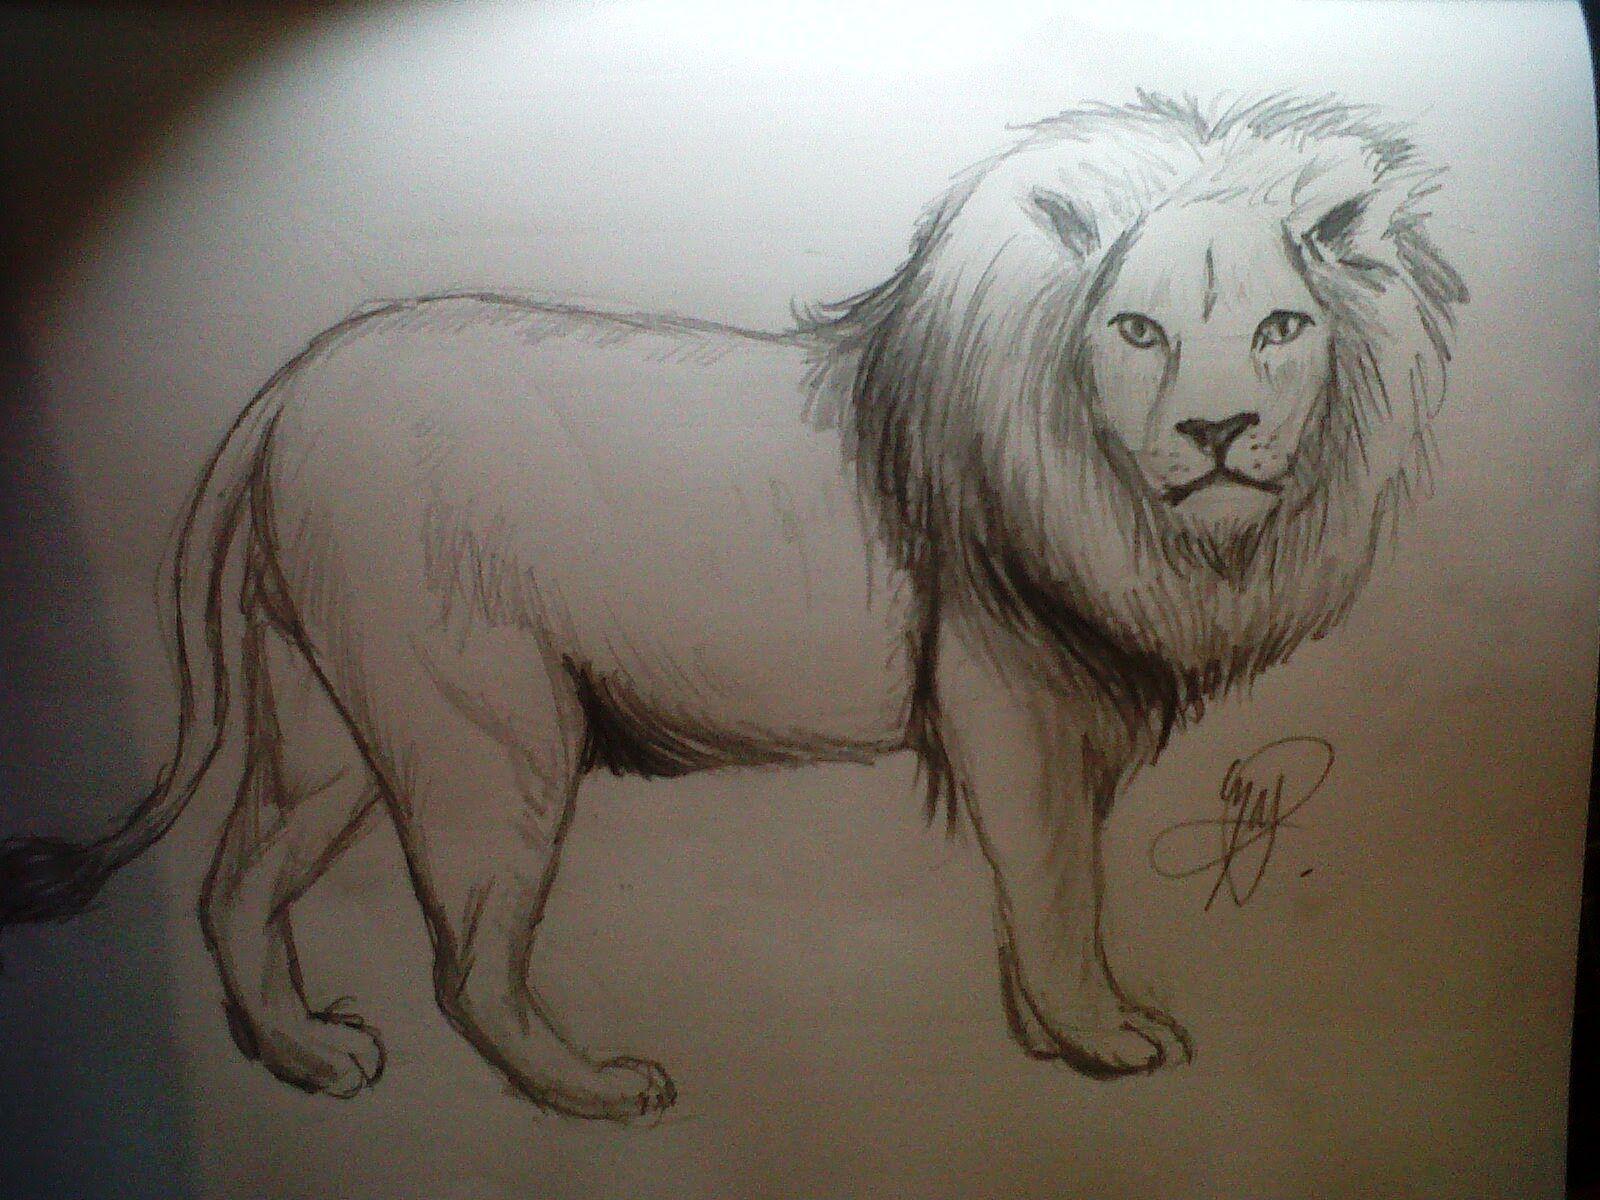 Dibujando Un Leon Realista Paso A Paso Como Dibujar Animales Como Dibujar Un Caballo Dibujos De Animales